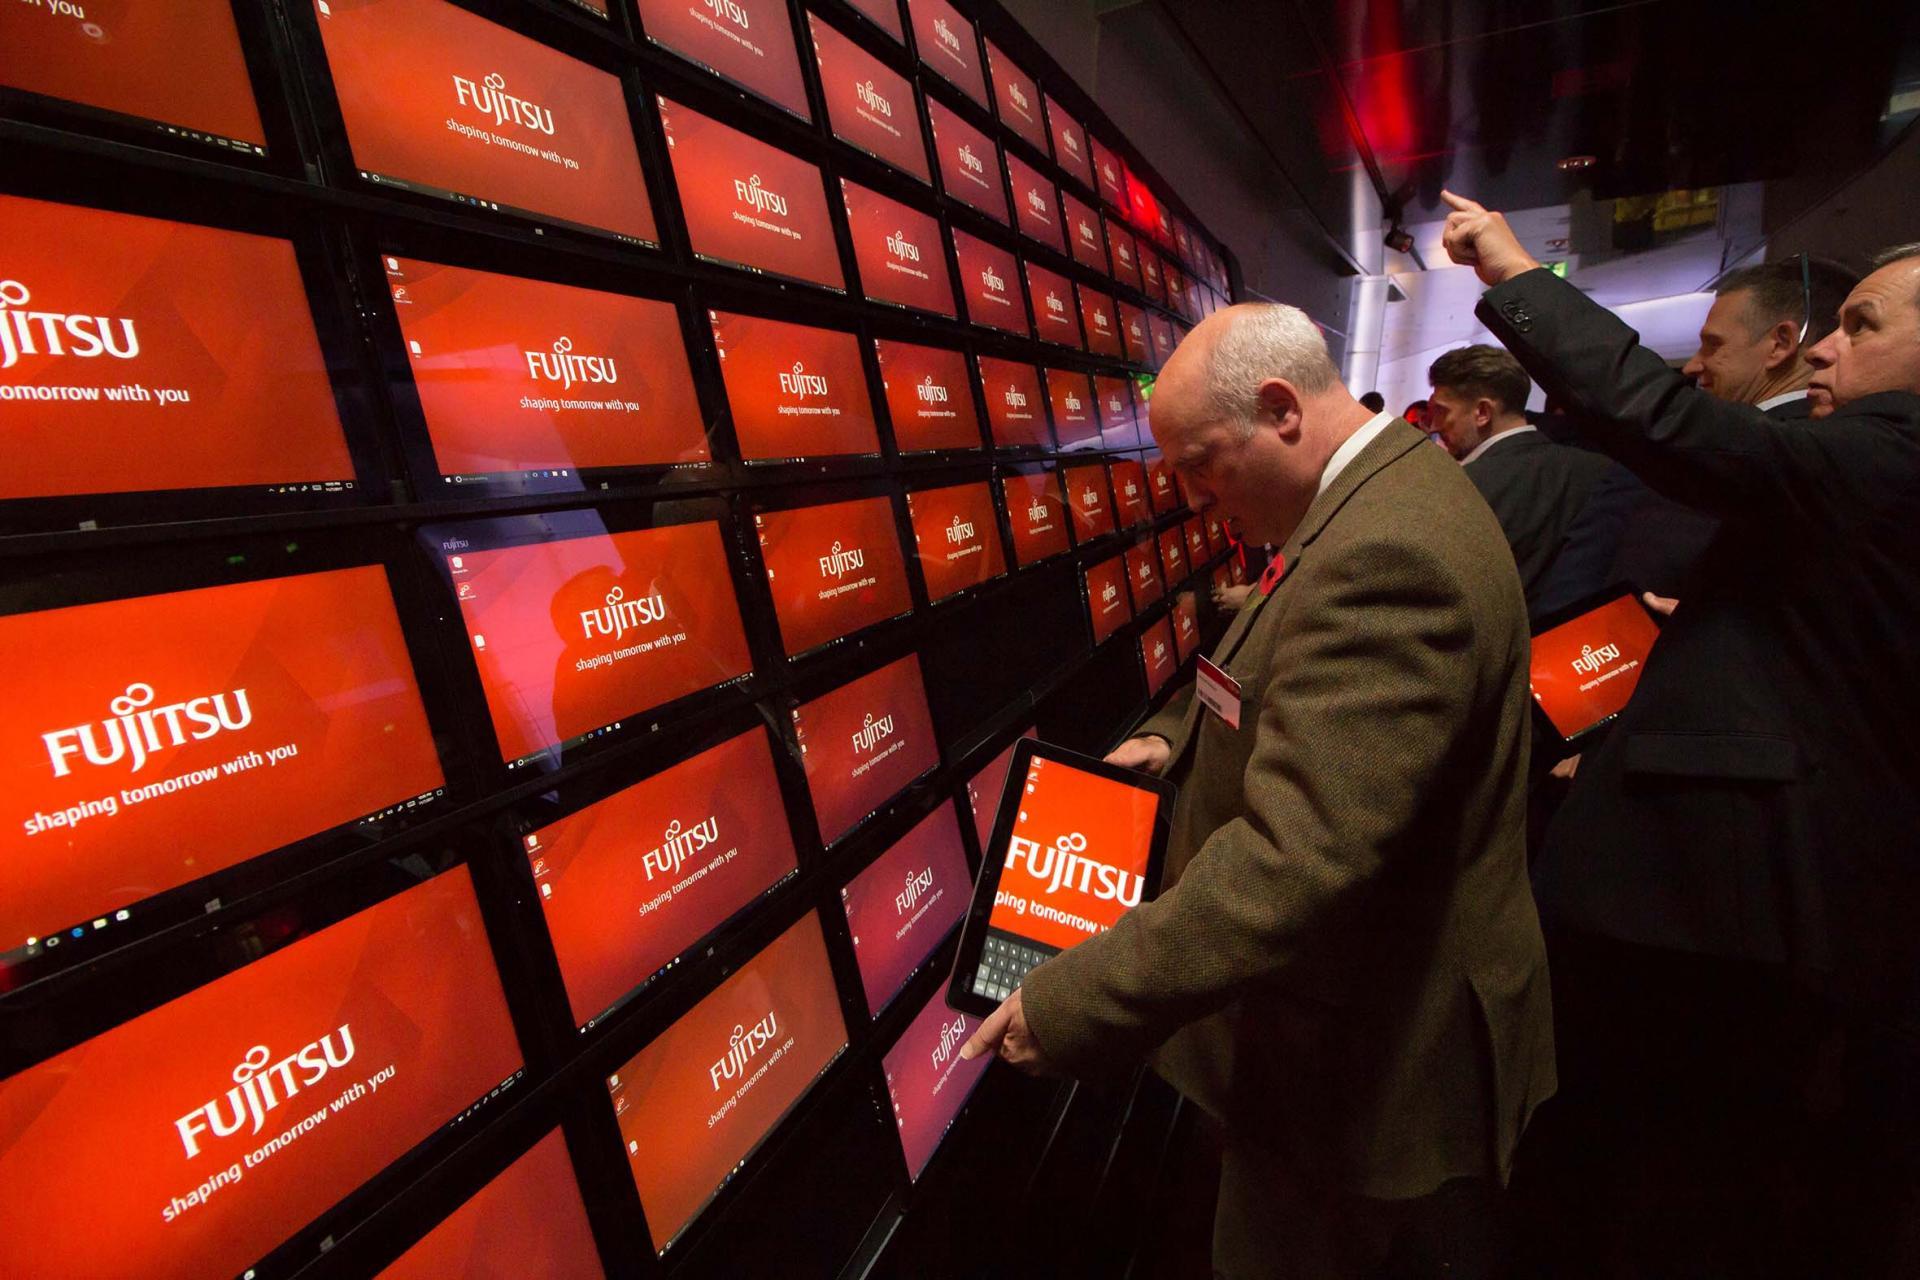 Fujitsu entra nei Guinness World Records